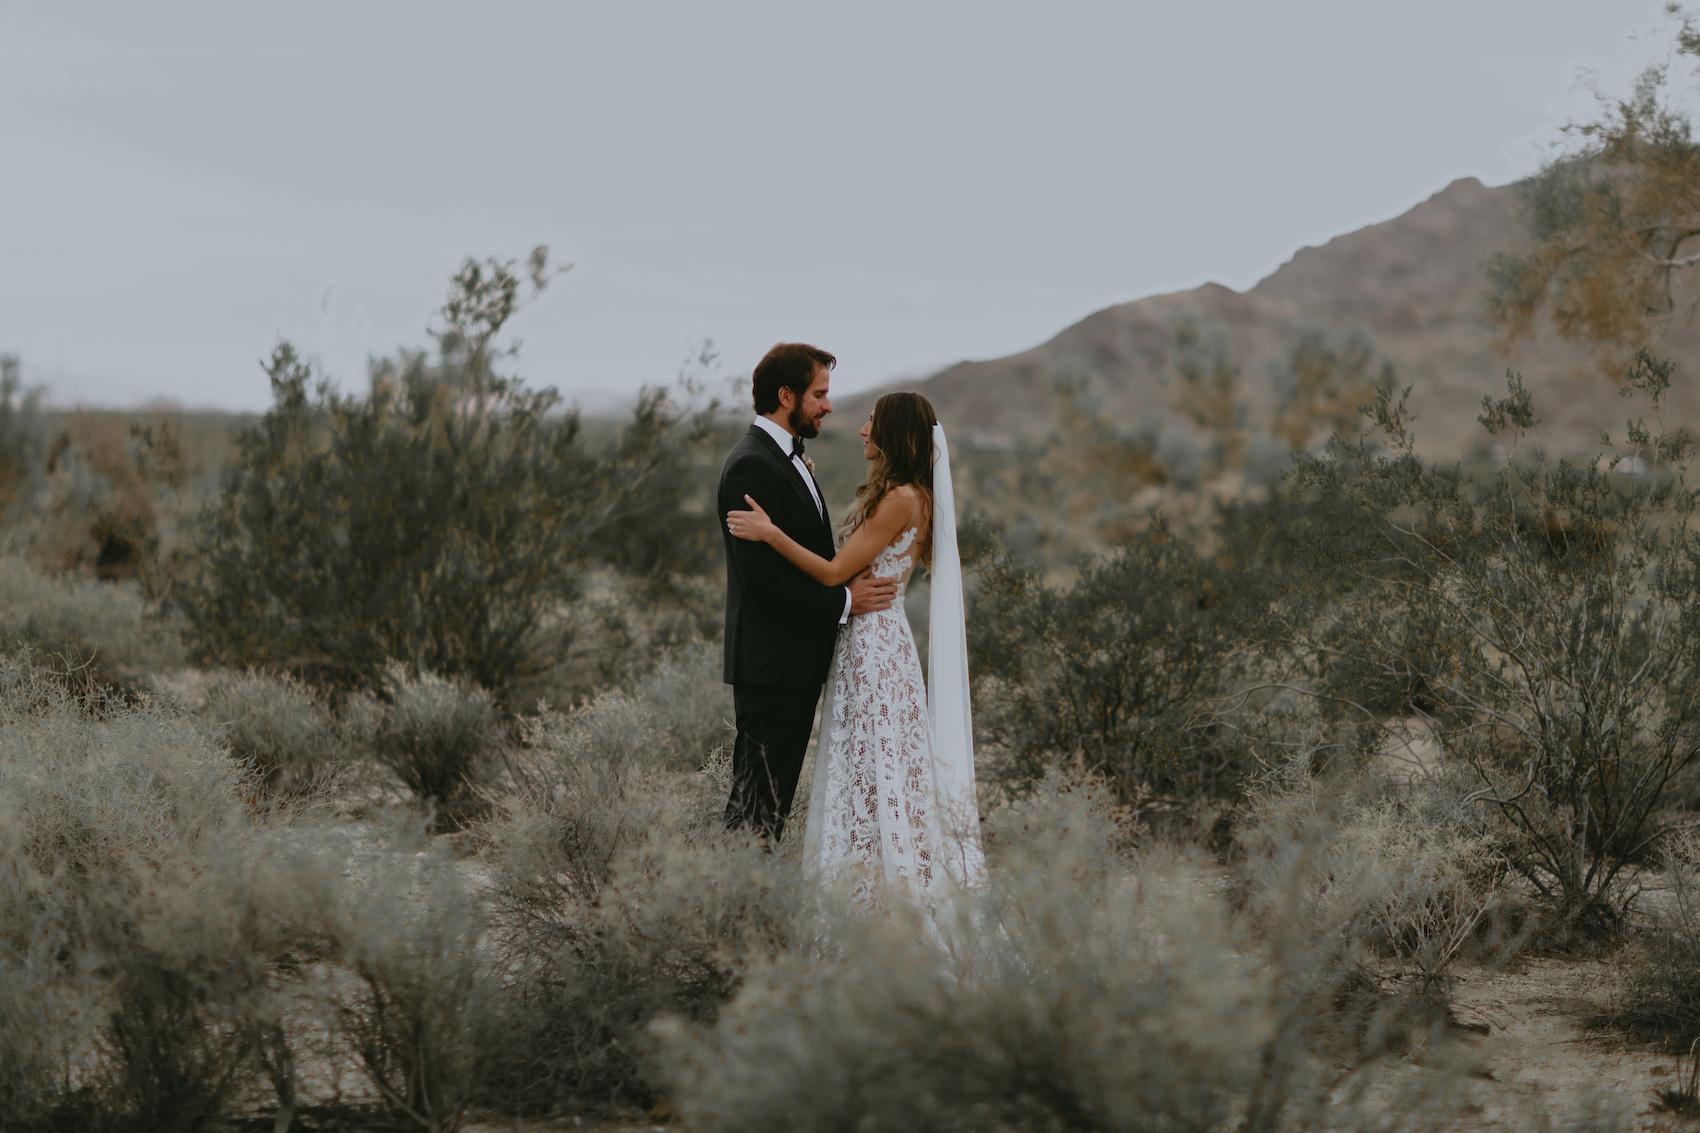 29-Palms-Inn-Joshua-Tree-Jewish-Wedding-H+M-49.jpg